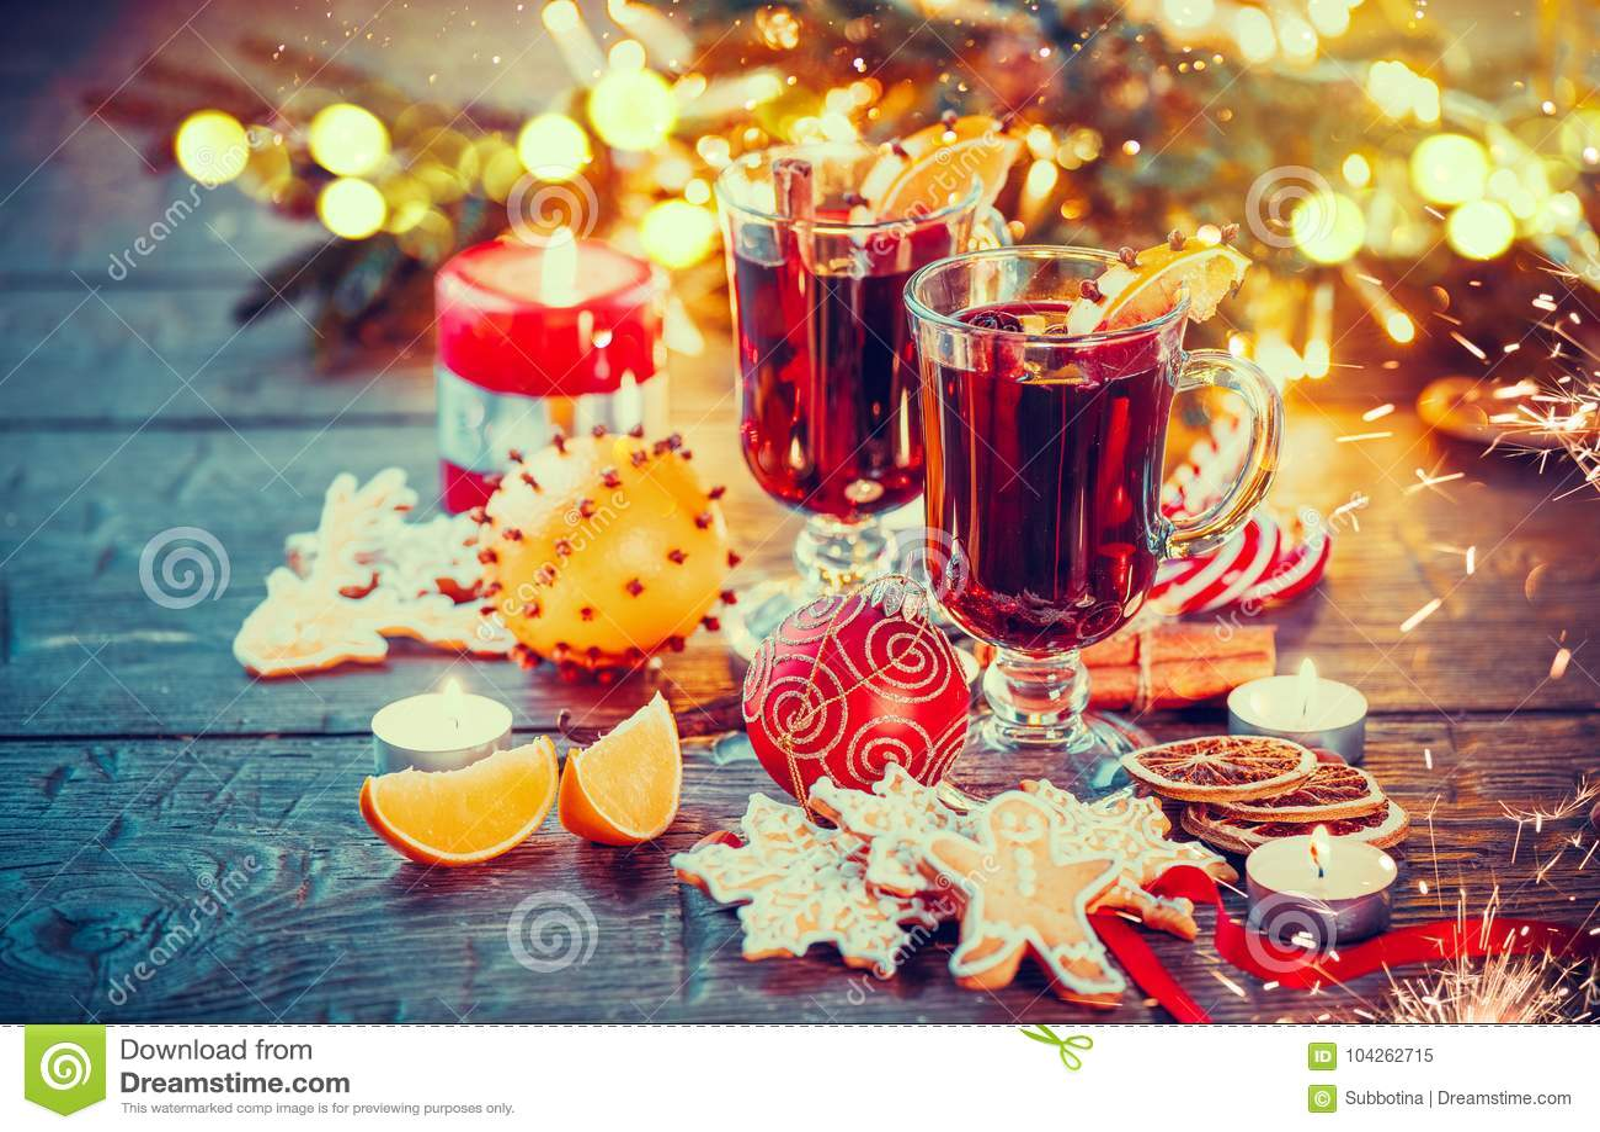 Download 圣诞节被仔细考虑的酒在度假装饰了桌 库存图片. 图片 包括有 节假日, 片式, 玻璃, 蜡烛, 桂香, 食物 - 104262715